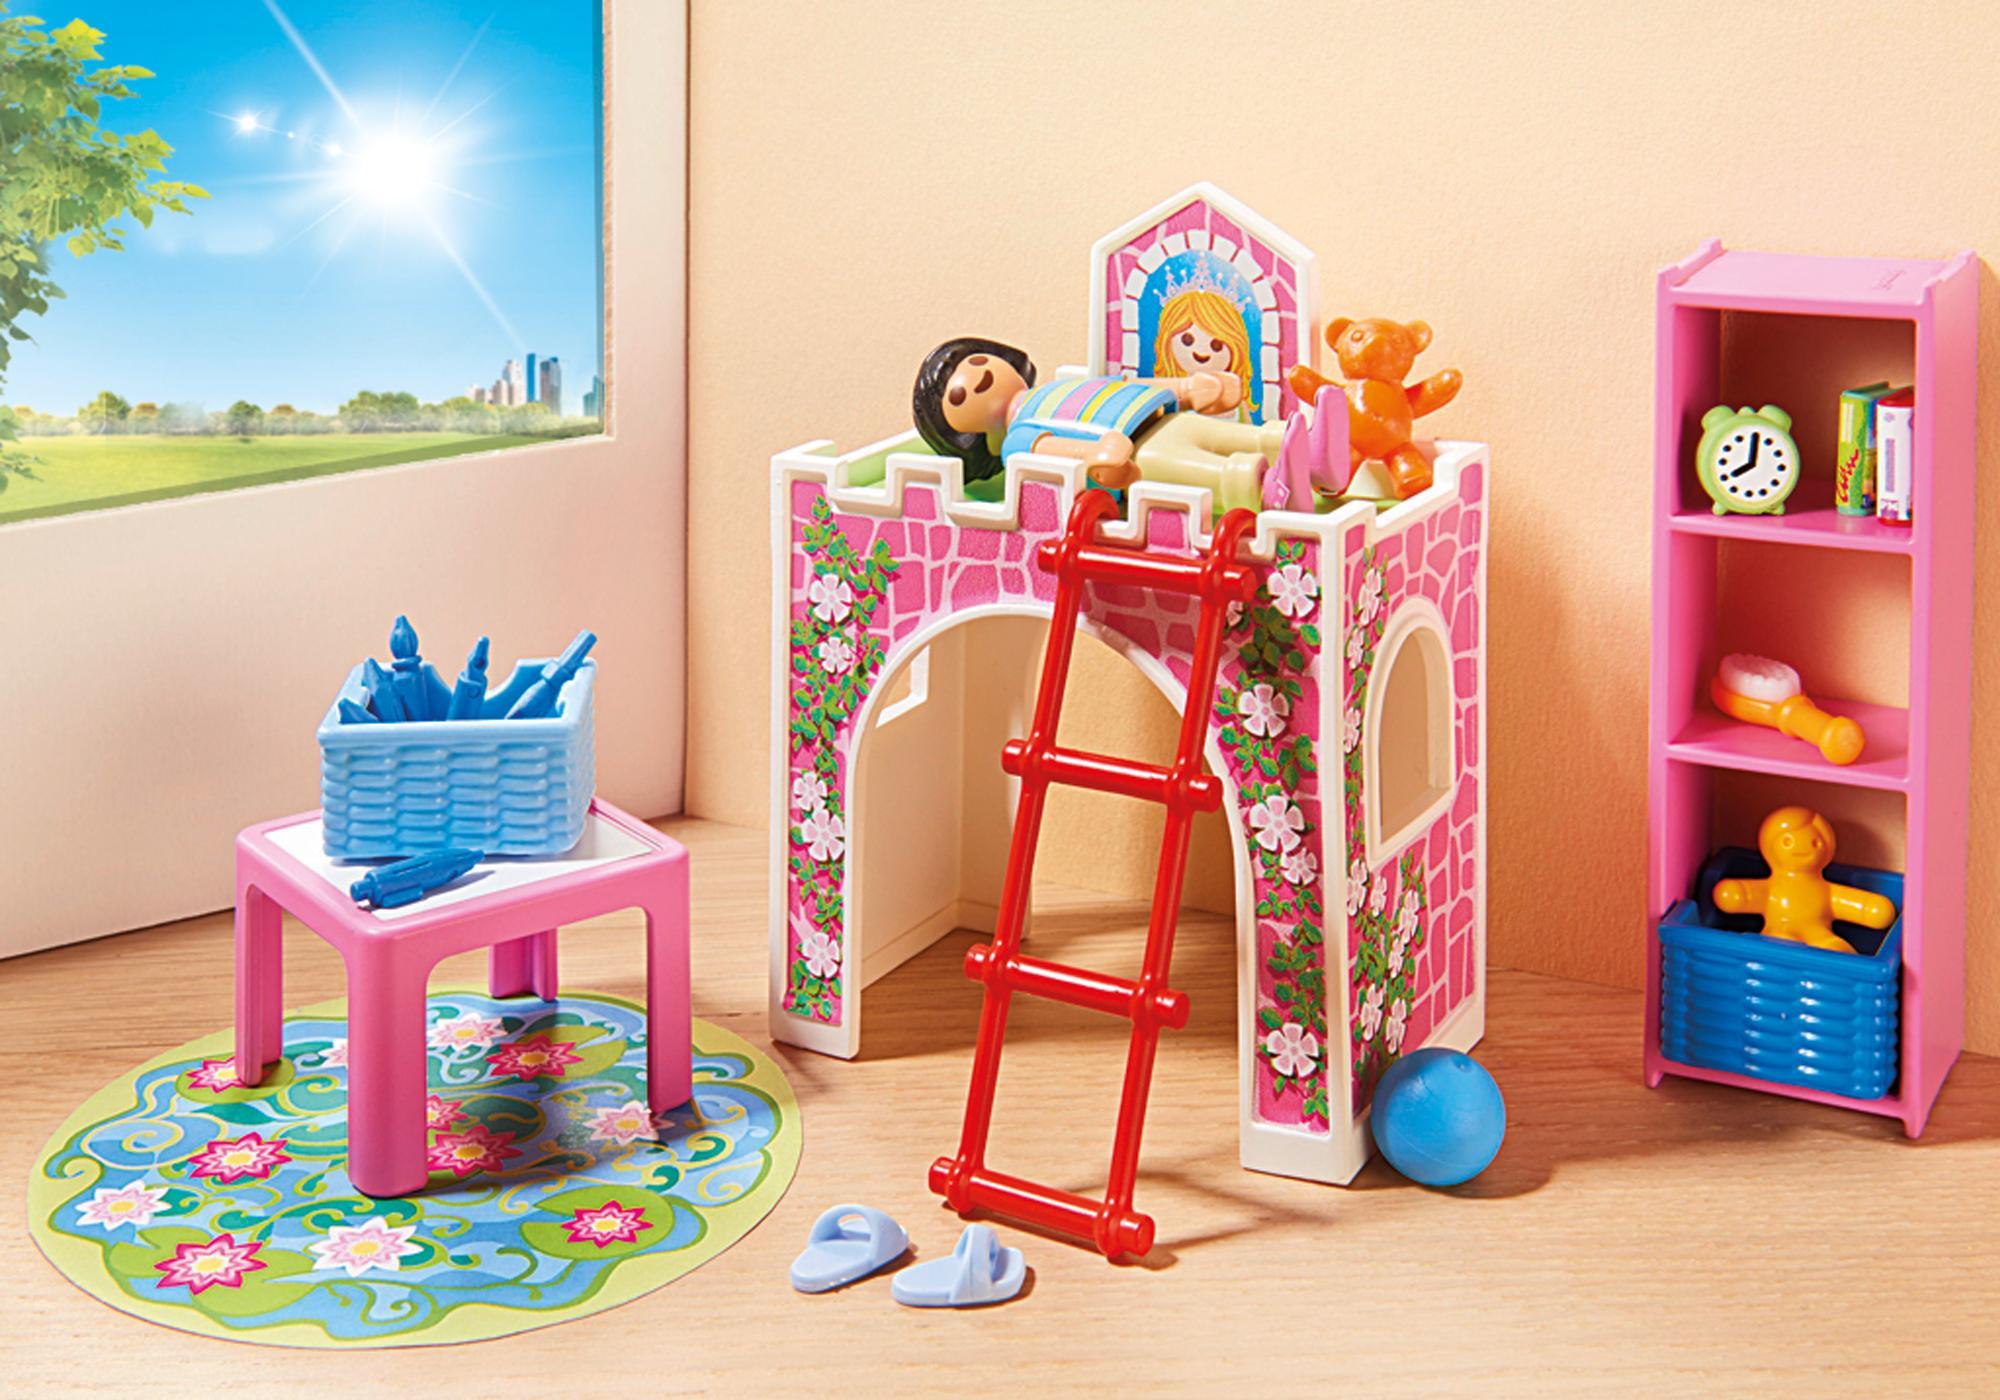 http://media.playmobil.com/i/playmobil/9270_product_extra1/Kinderkamer met hoogslaper